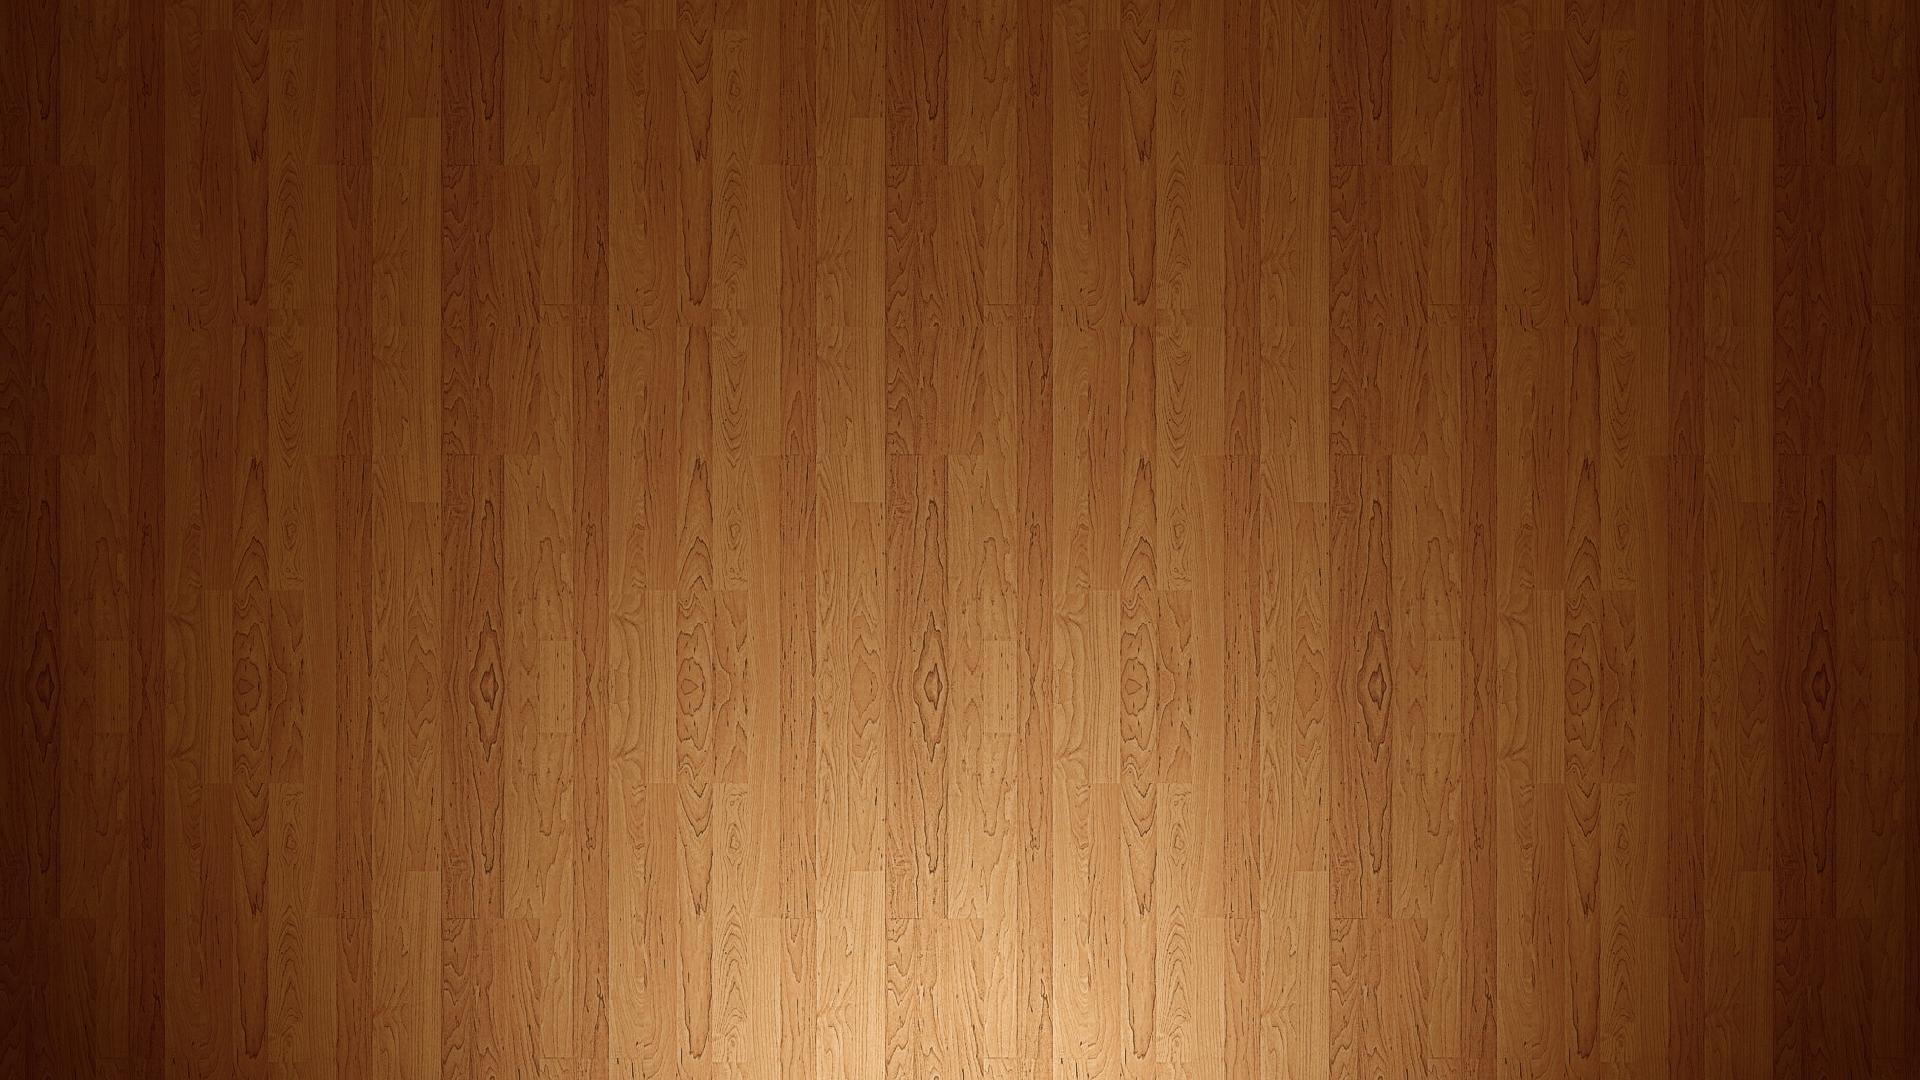 Download Wood Panels Wallpaper 1920x1080 Wallpoper 391147 1920x1080